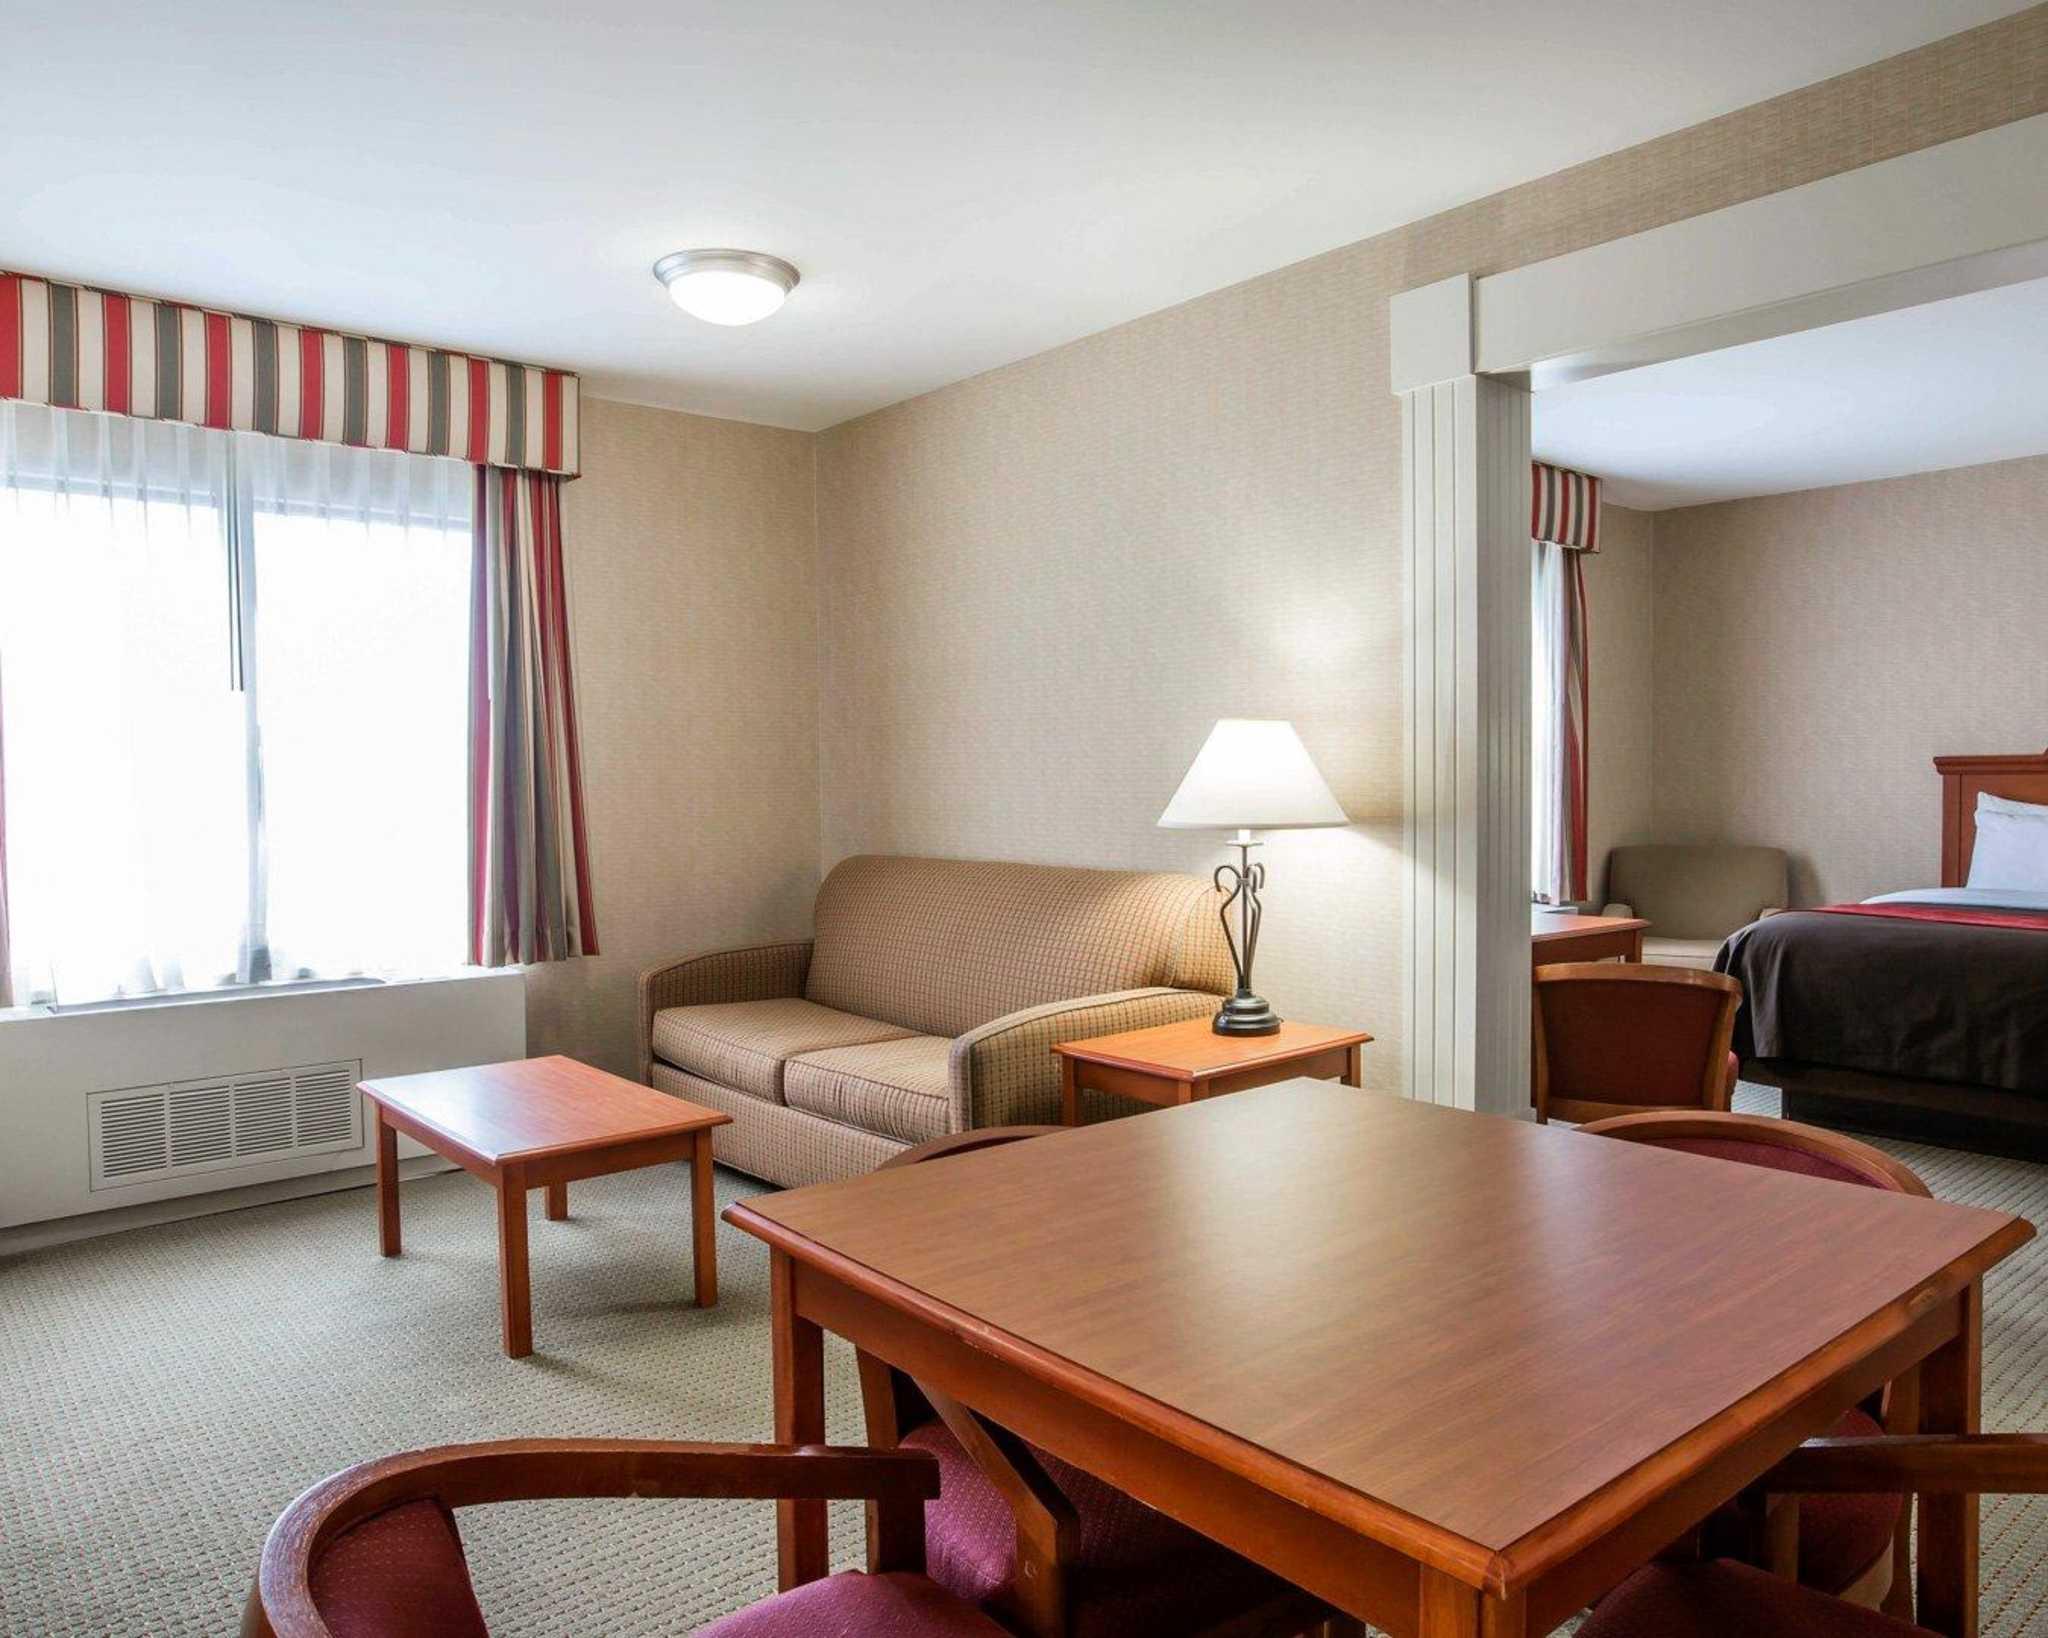 Comfort Inn & Suites adj to Akwesasne Mohawk Casino image 43